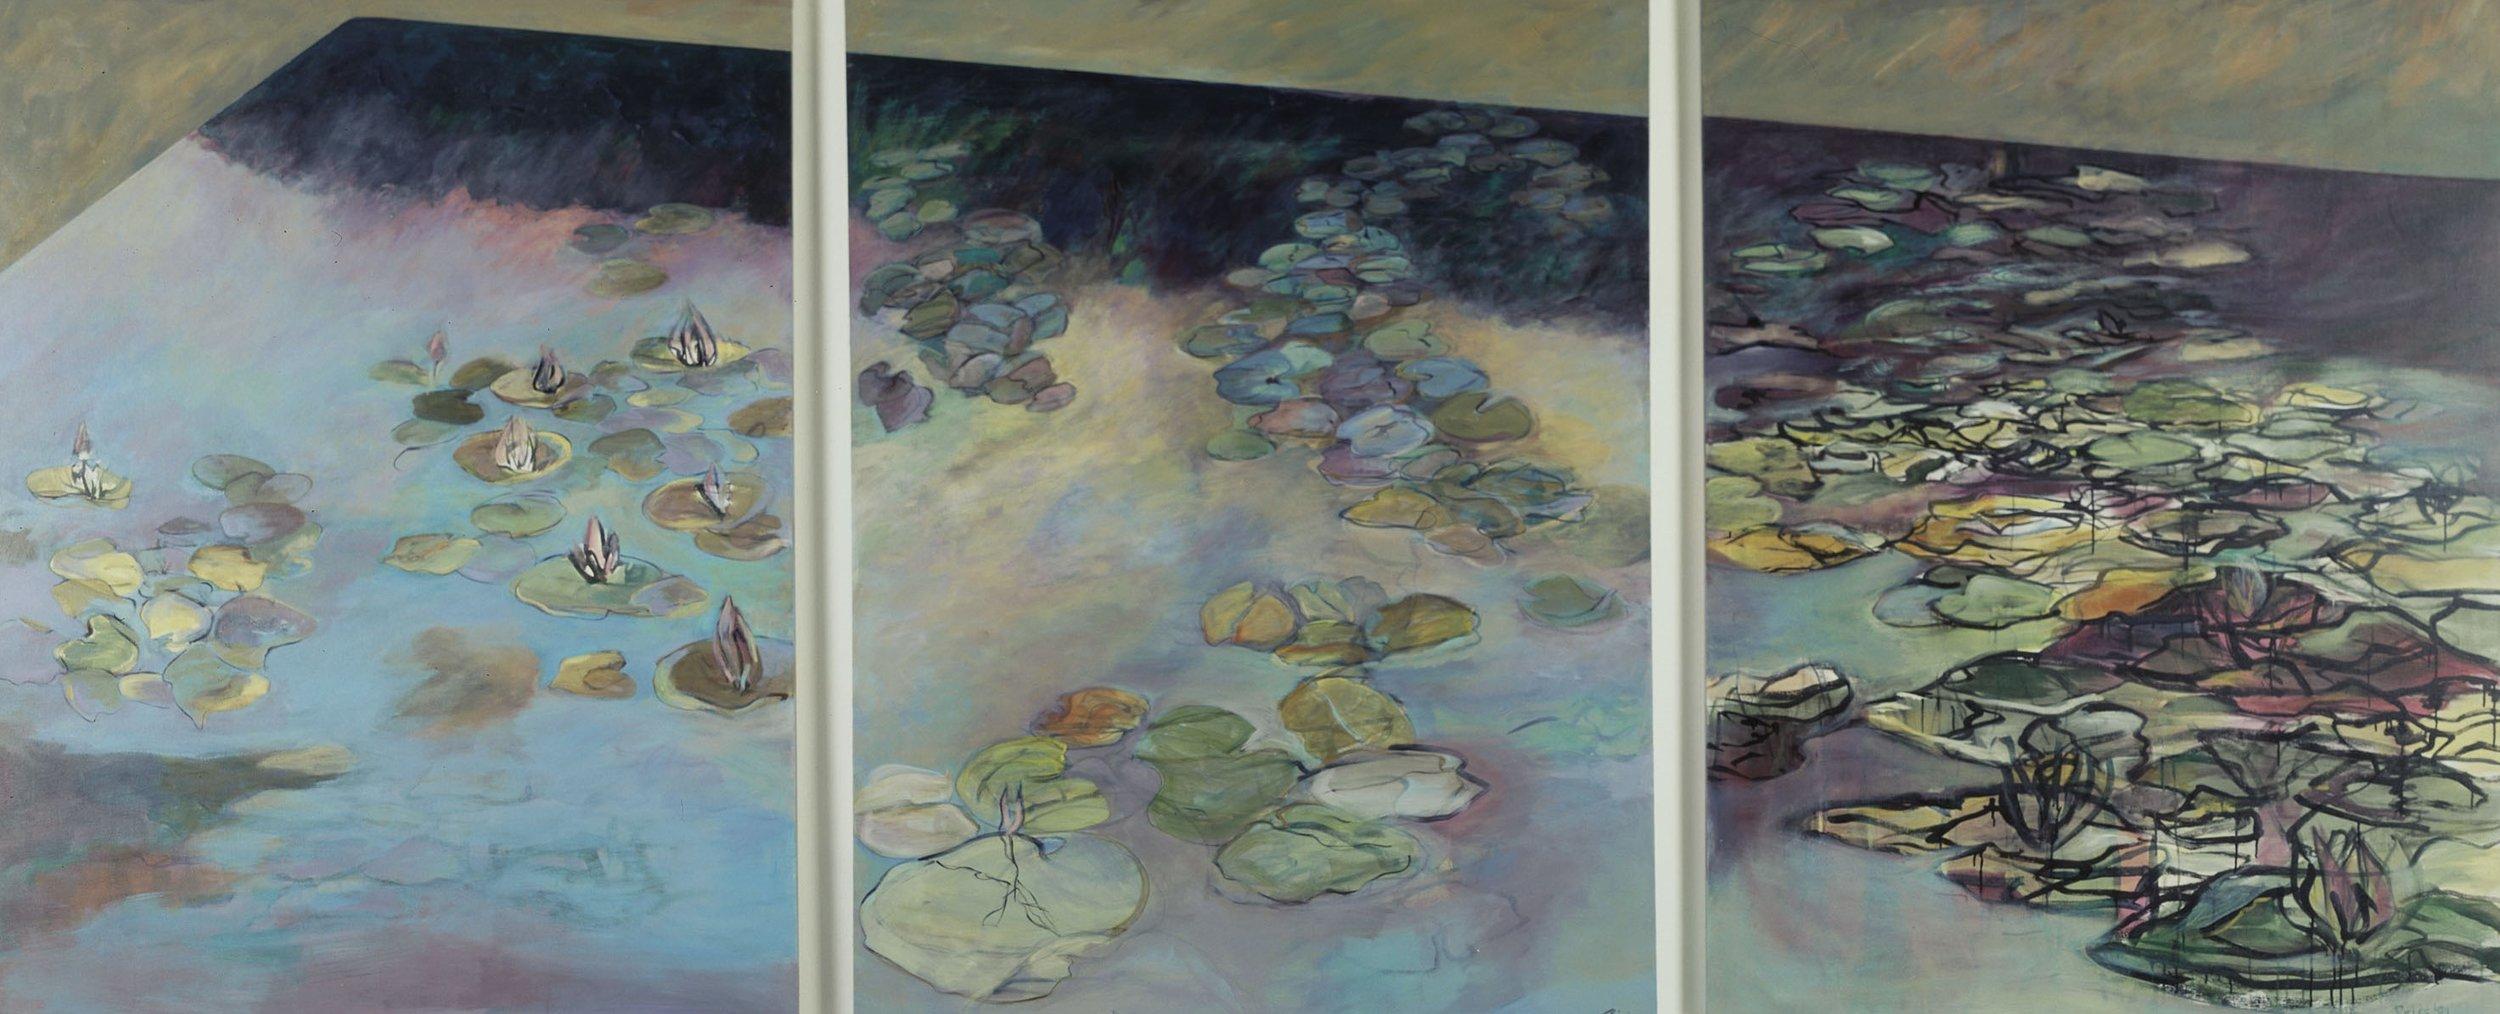 Le Ninfee Triptych